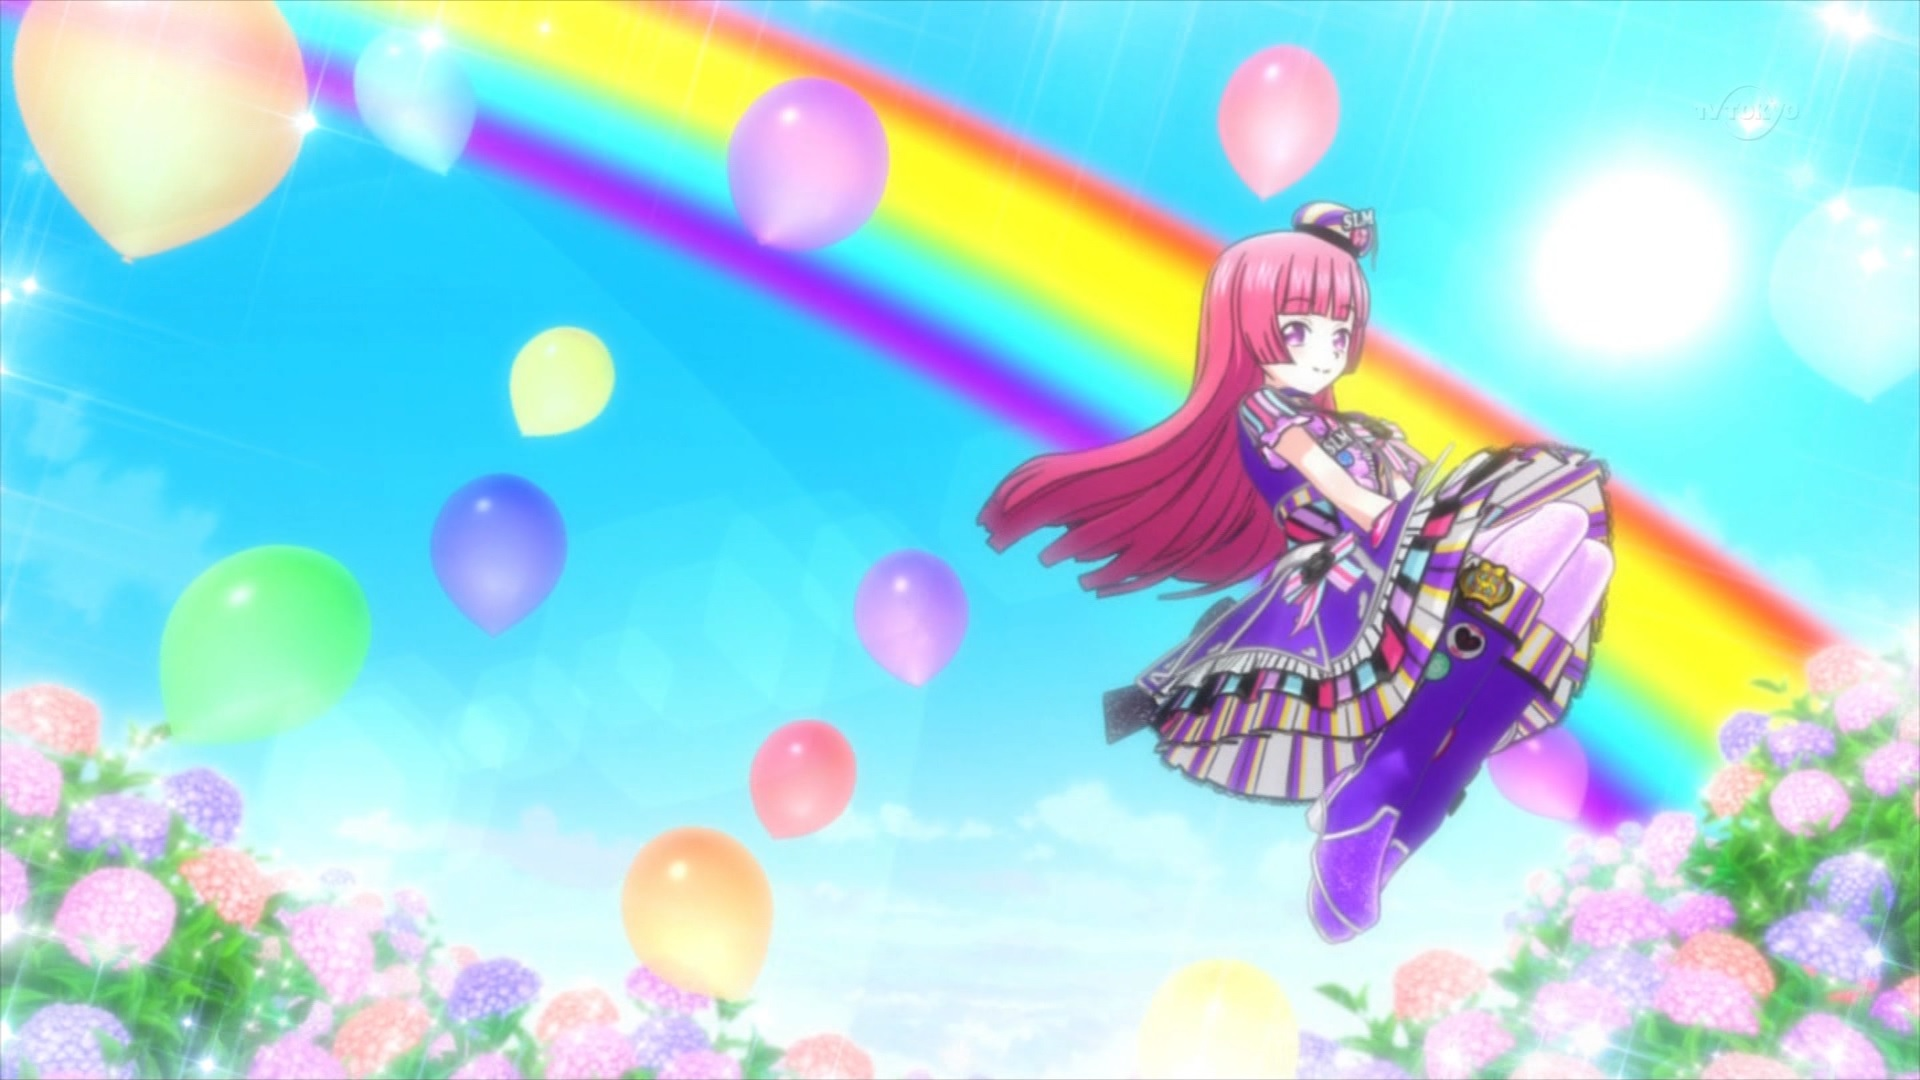 Red Flash Revolutionを歌う北条そふぃ(5)